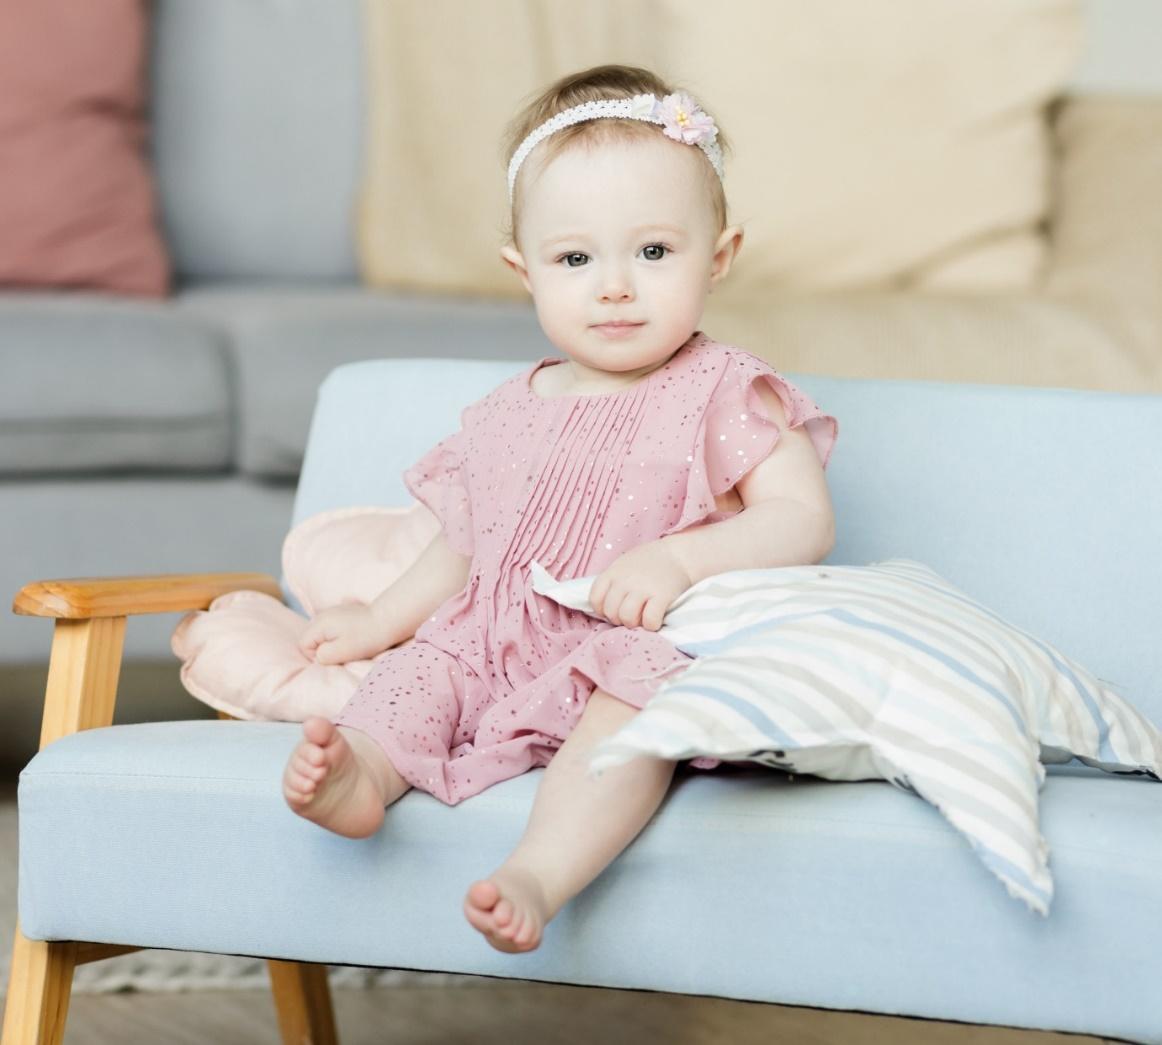 Pretty baby expression